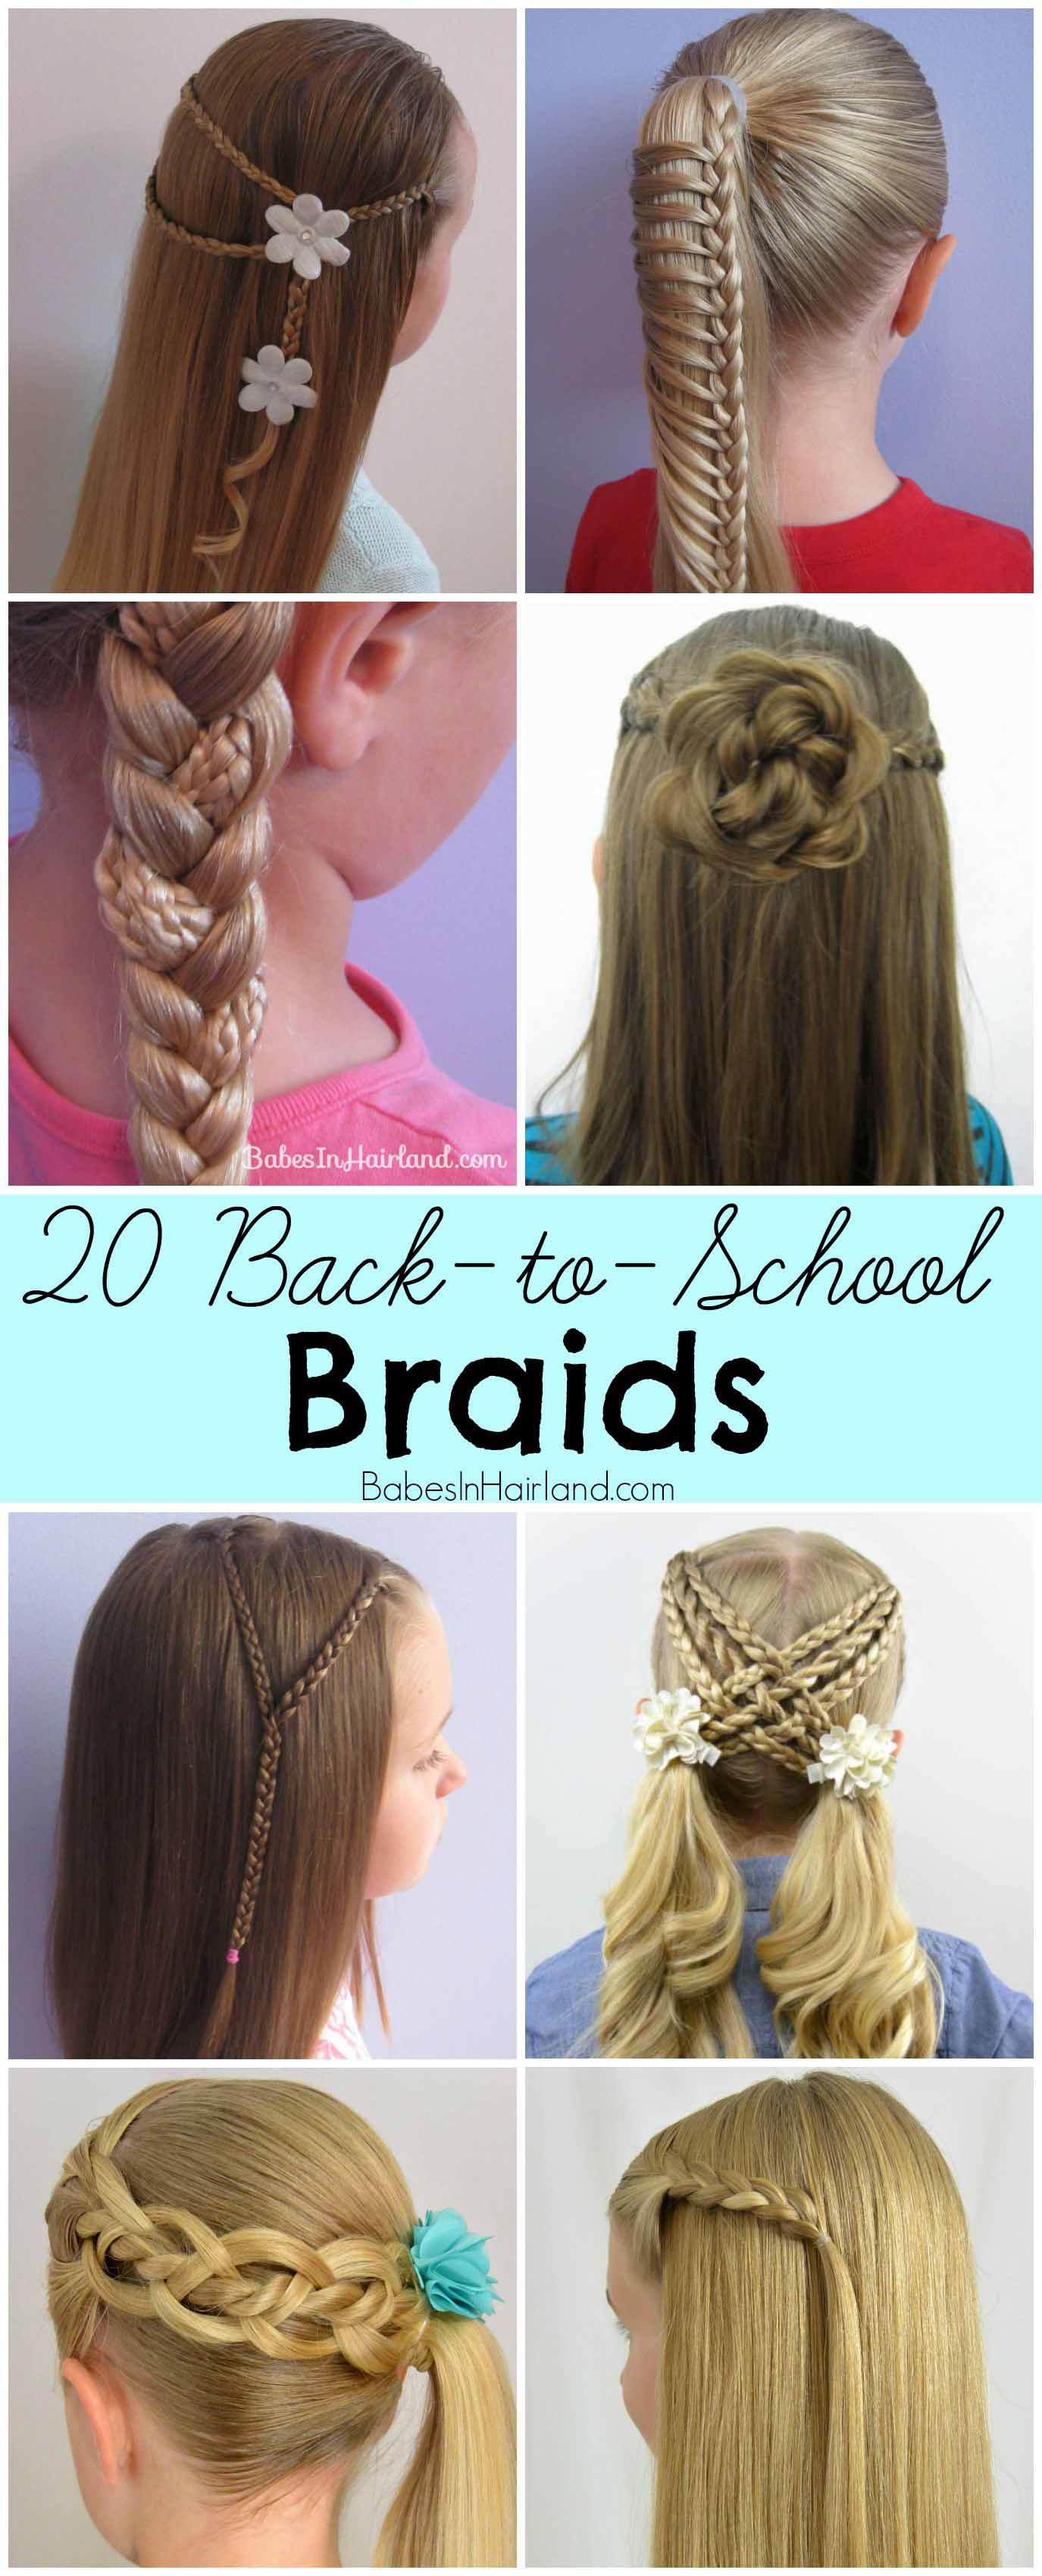 20 Back-to-School BraidsA